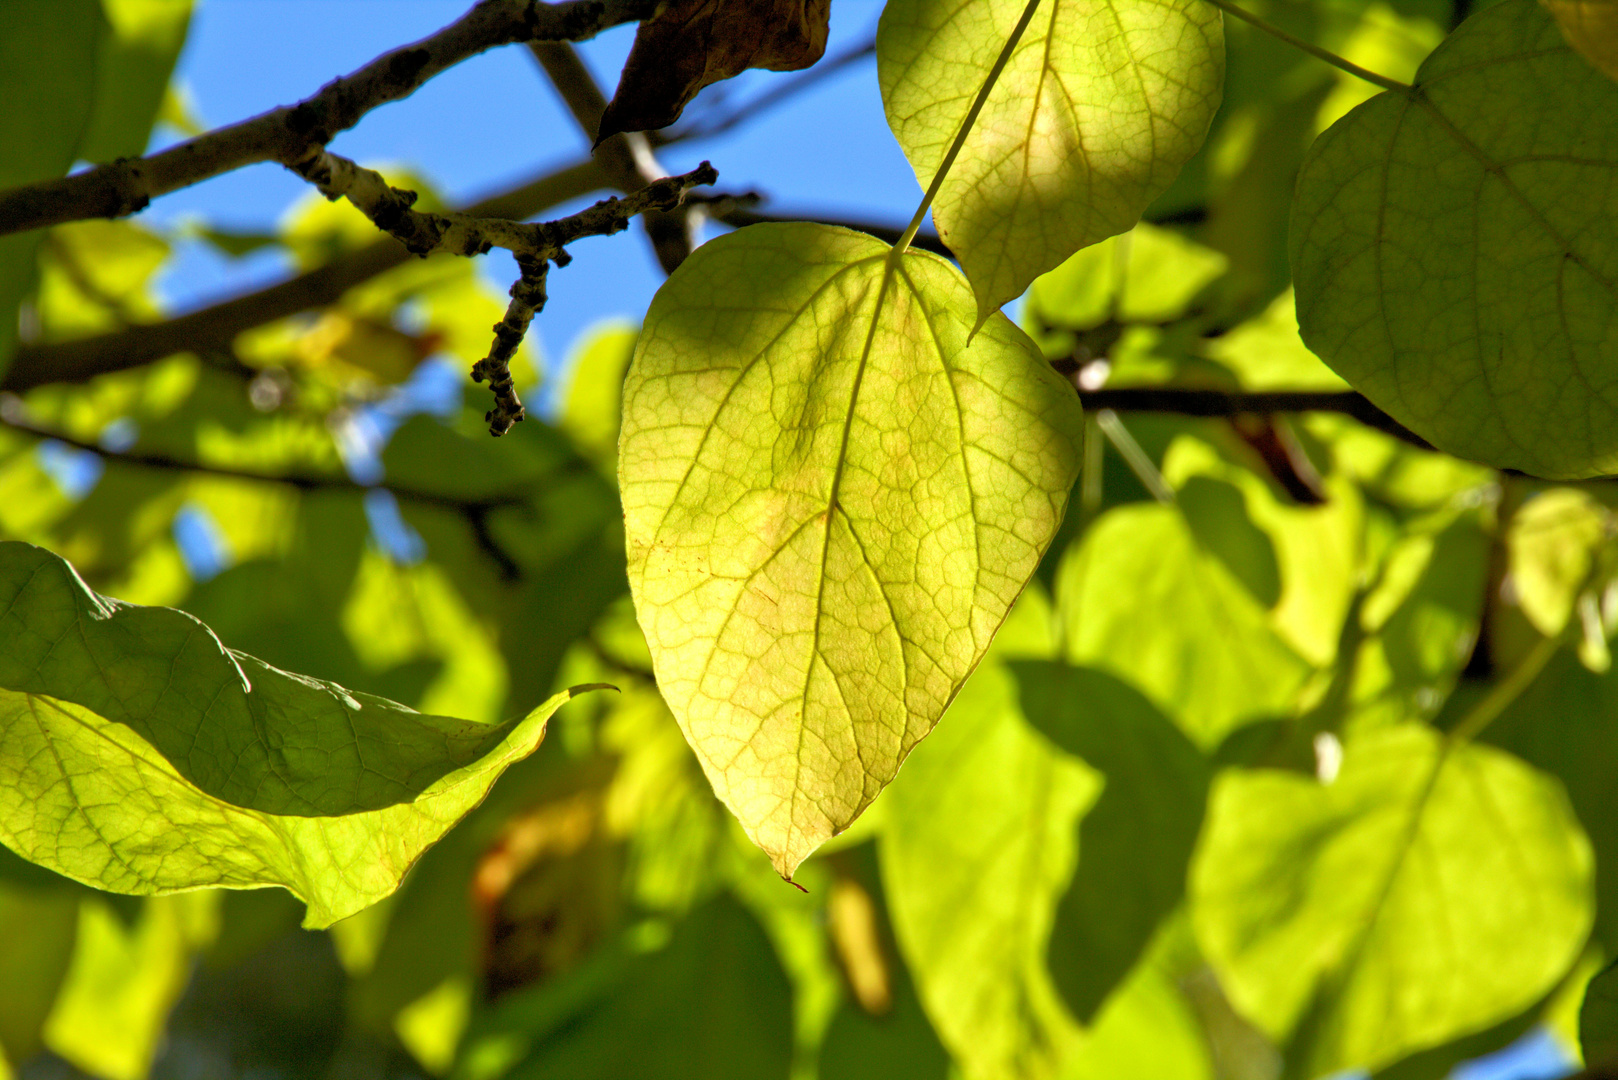 Herbst in Boltenhagen